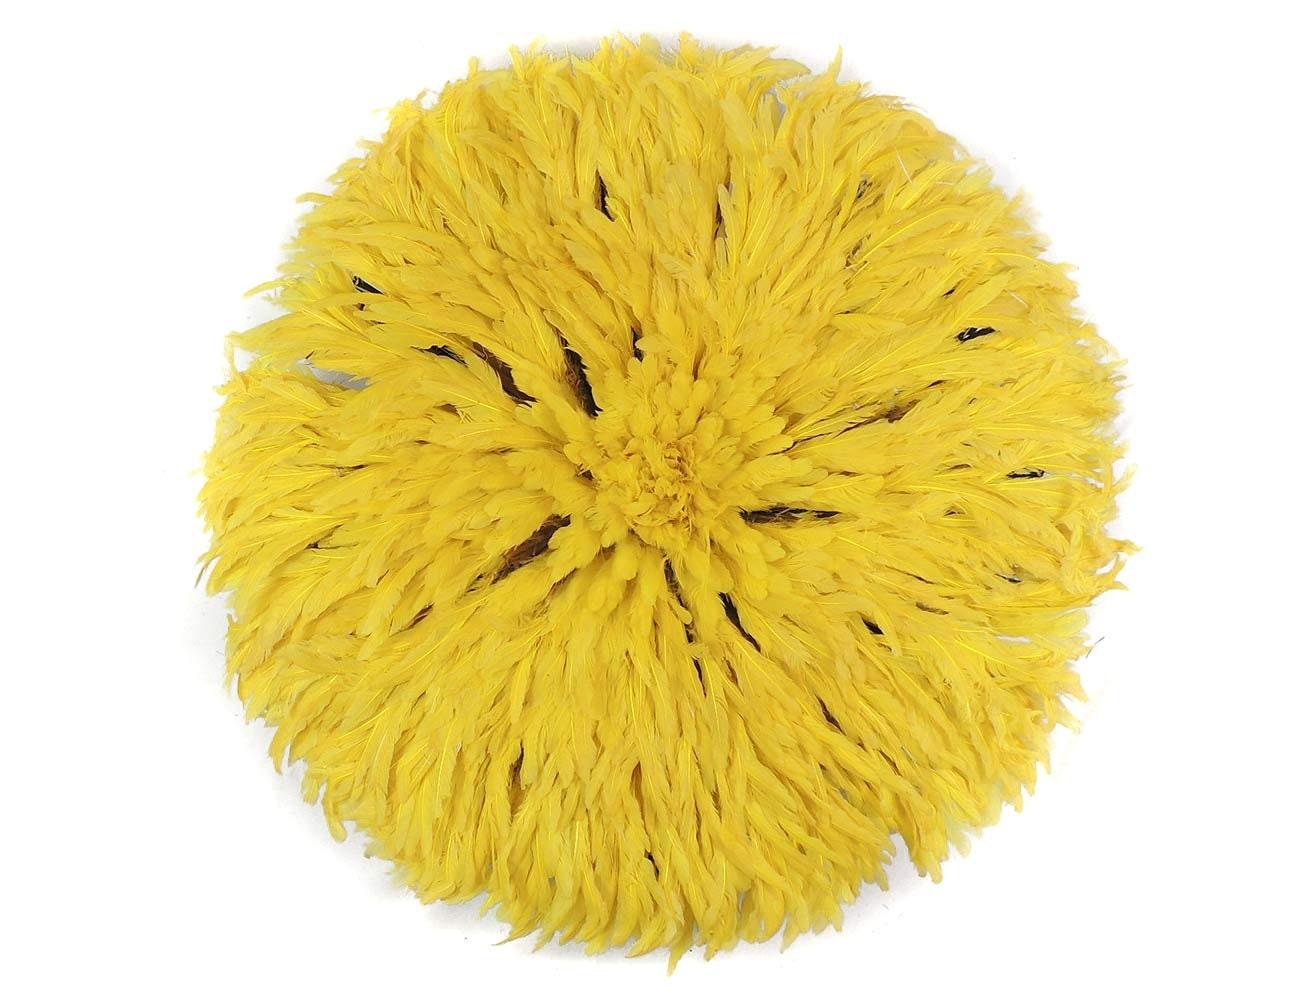 Juju Feather Headdress Bamileke Cameroon African Art Yellow